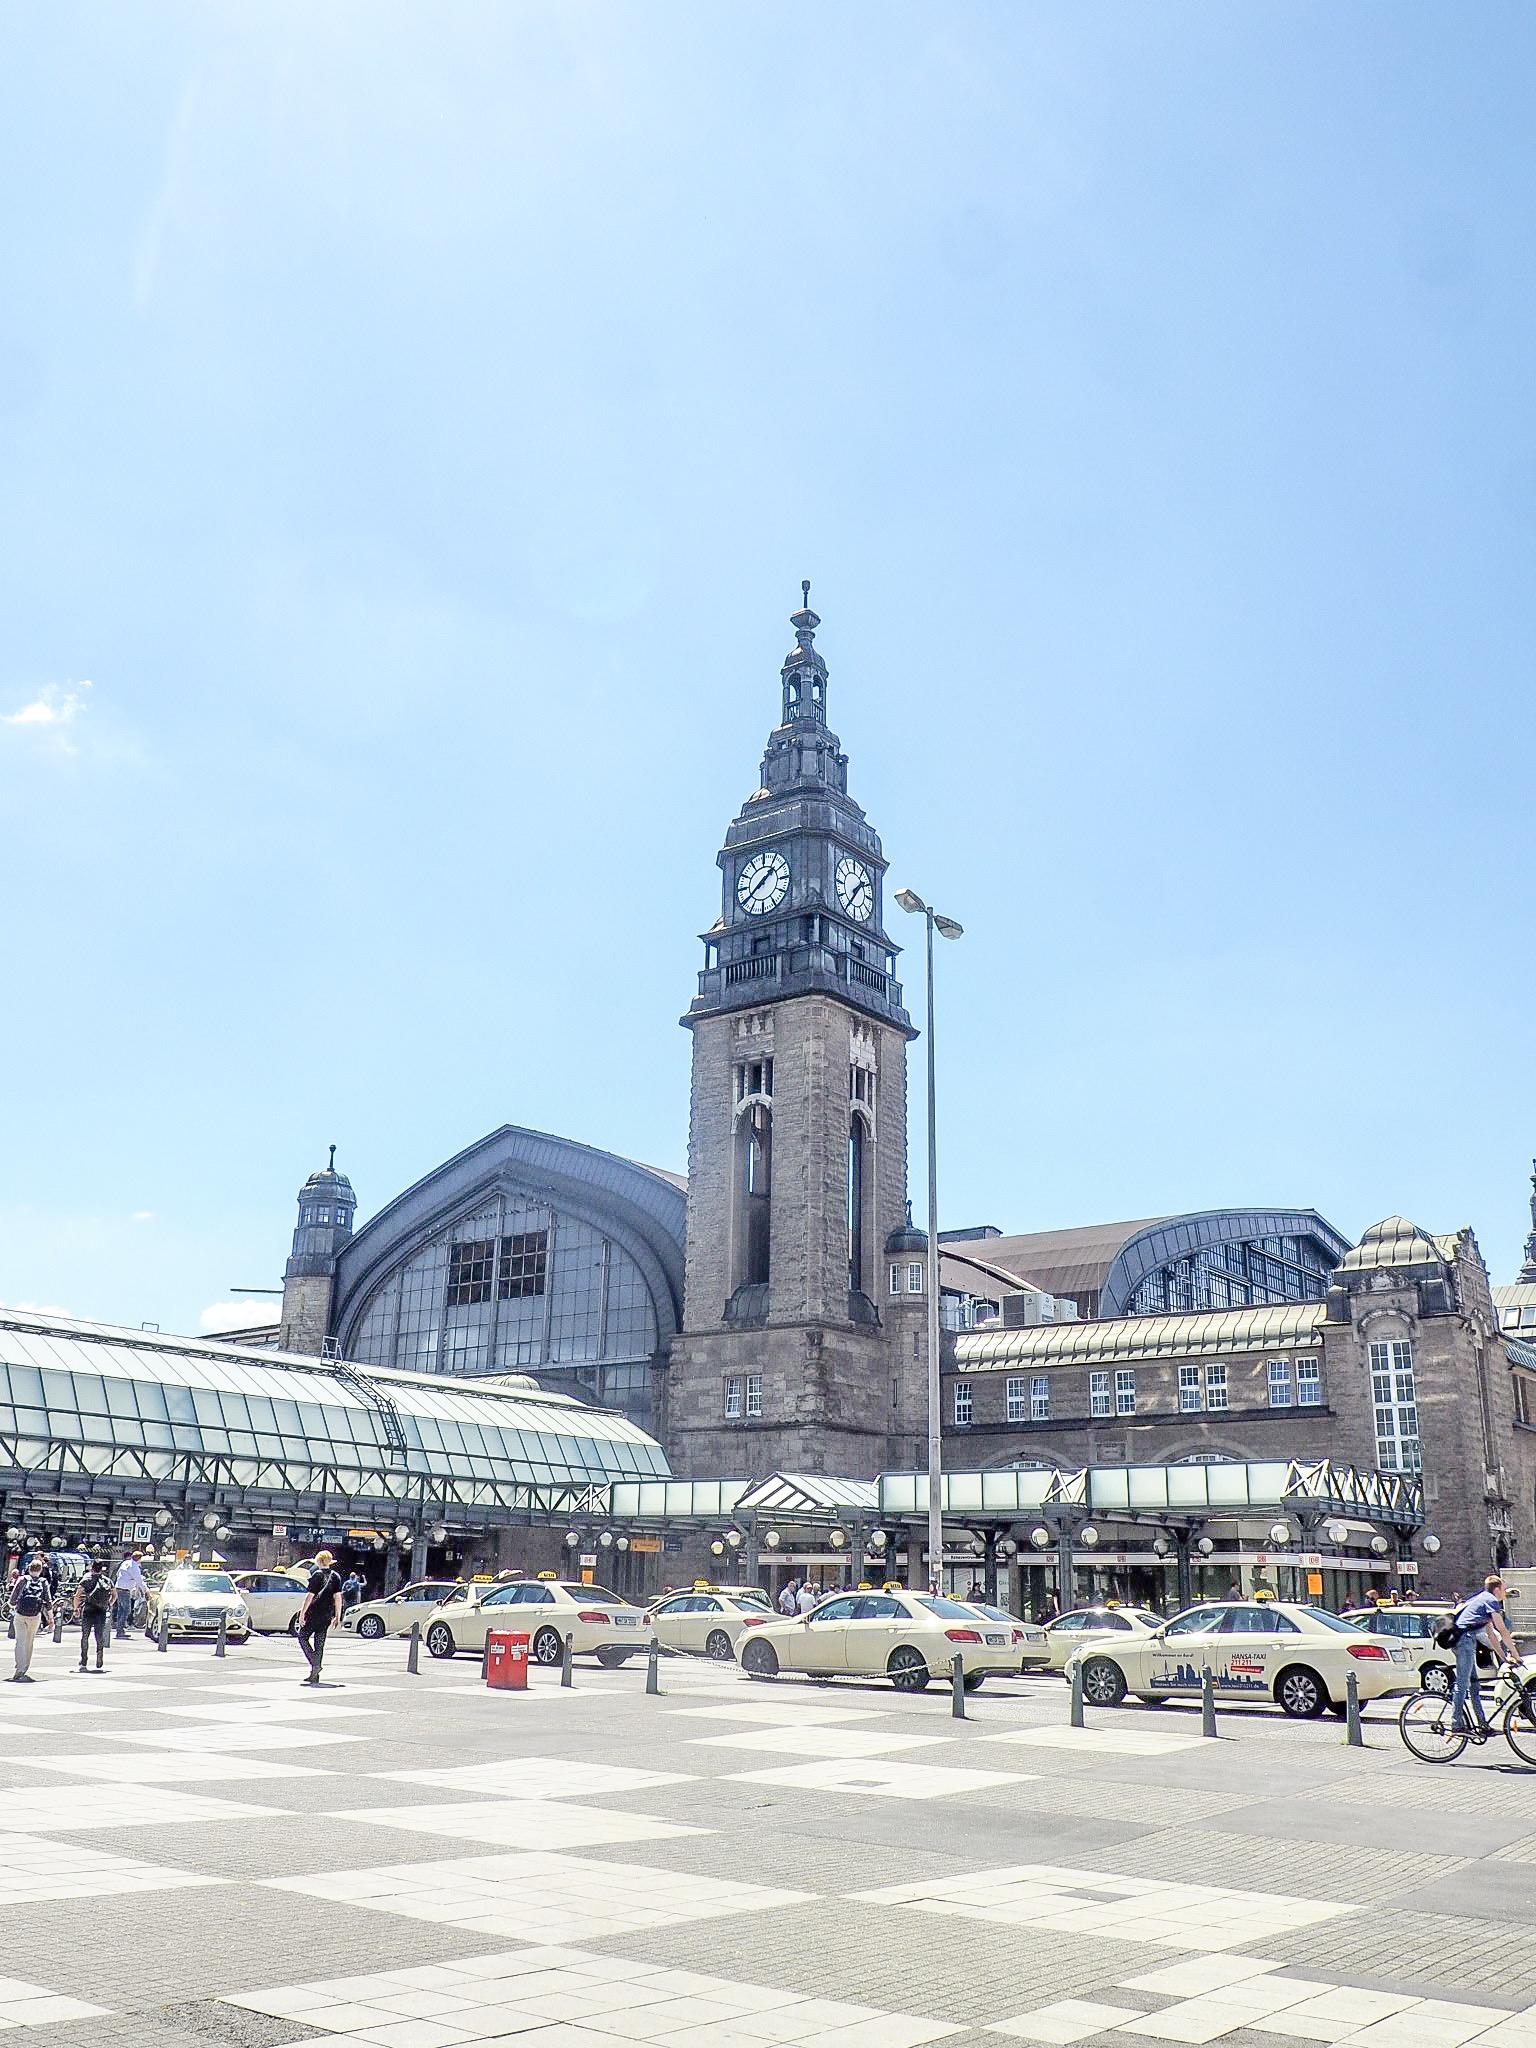 hamburg central train station